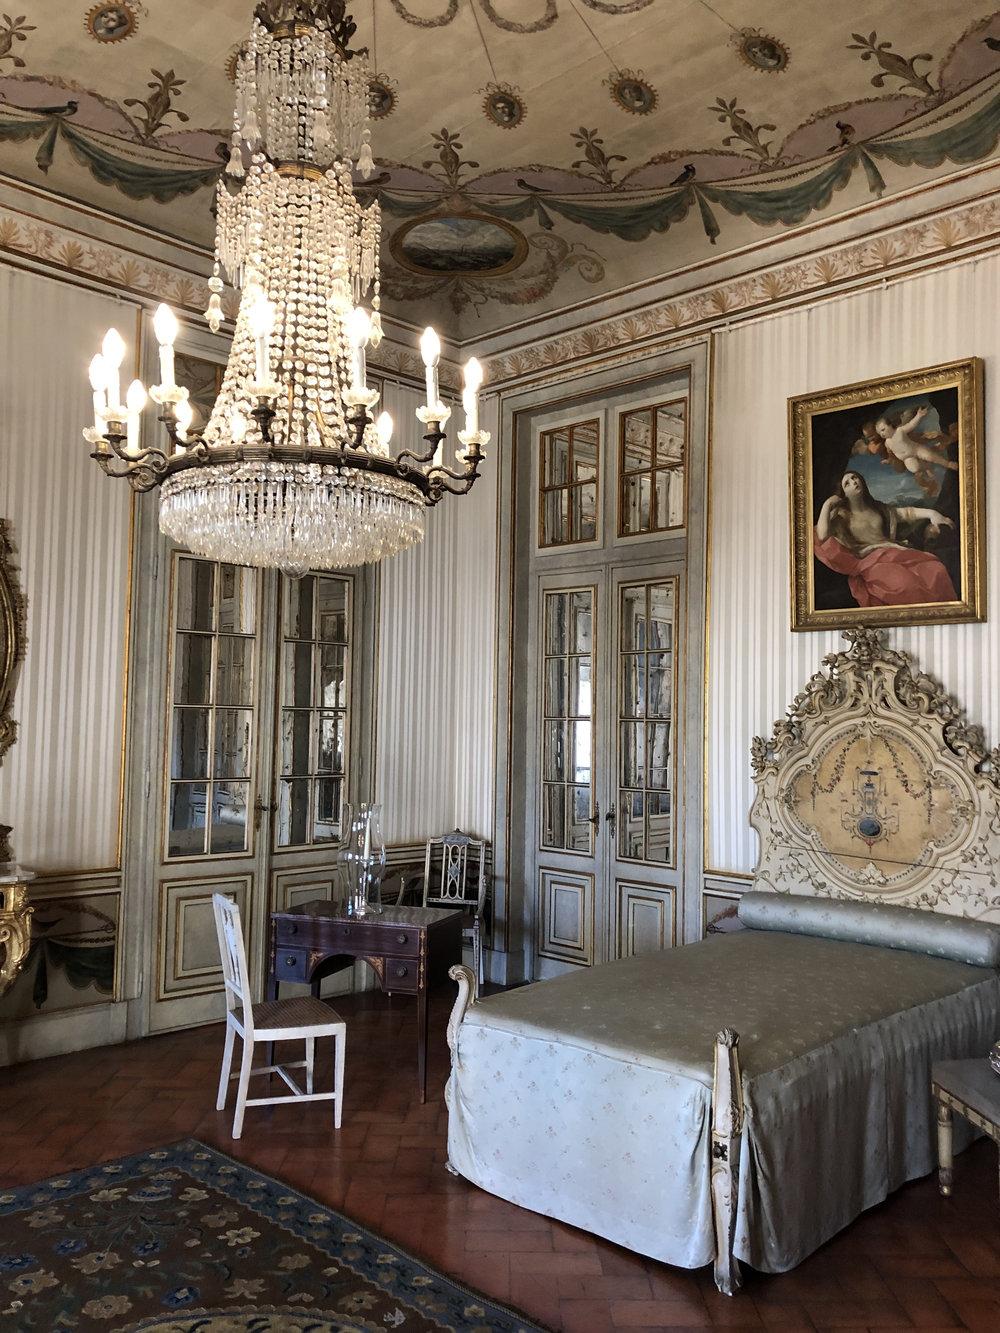 teri_lisbon_portugal_palaceofquelez_spiritedtable_photo15.jpg